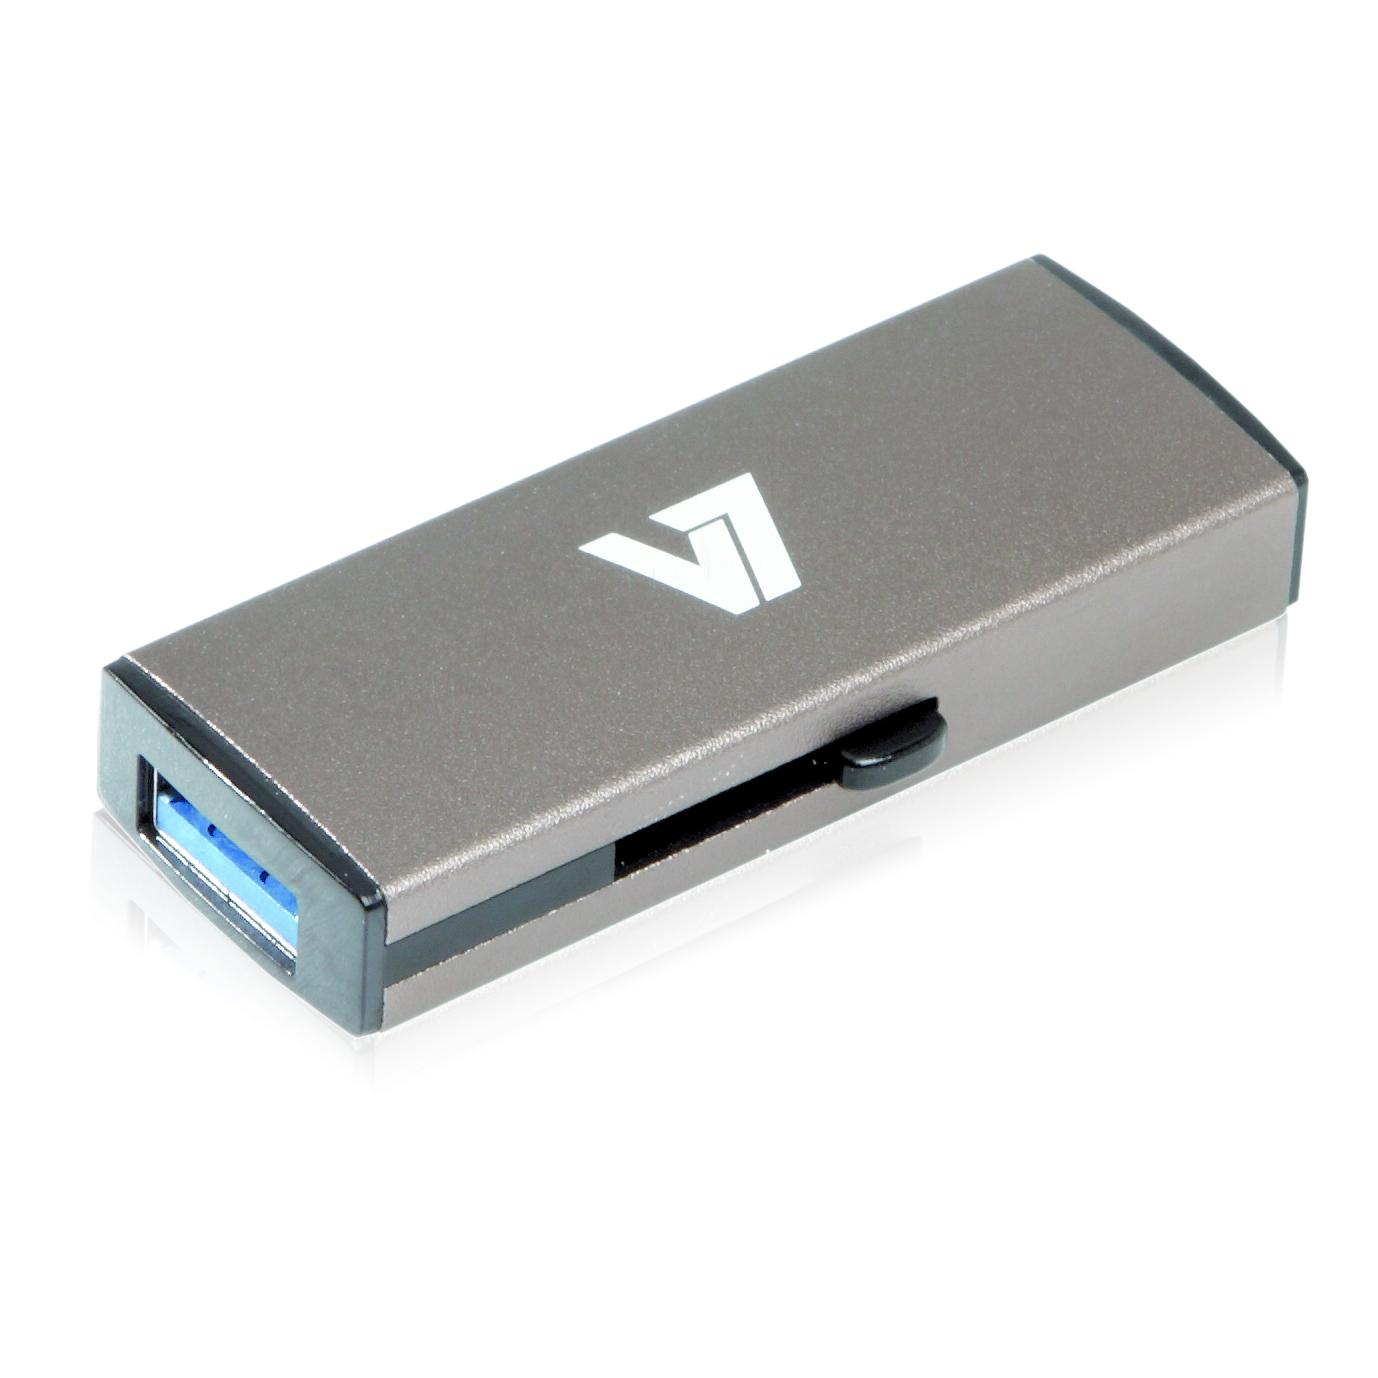 V7 Slide-In USB 3.0 Flash Drive 32GB grey USB flash drive